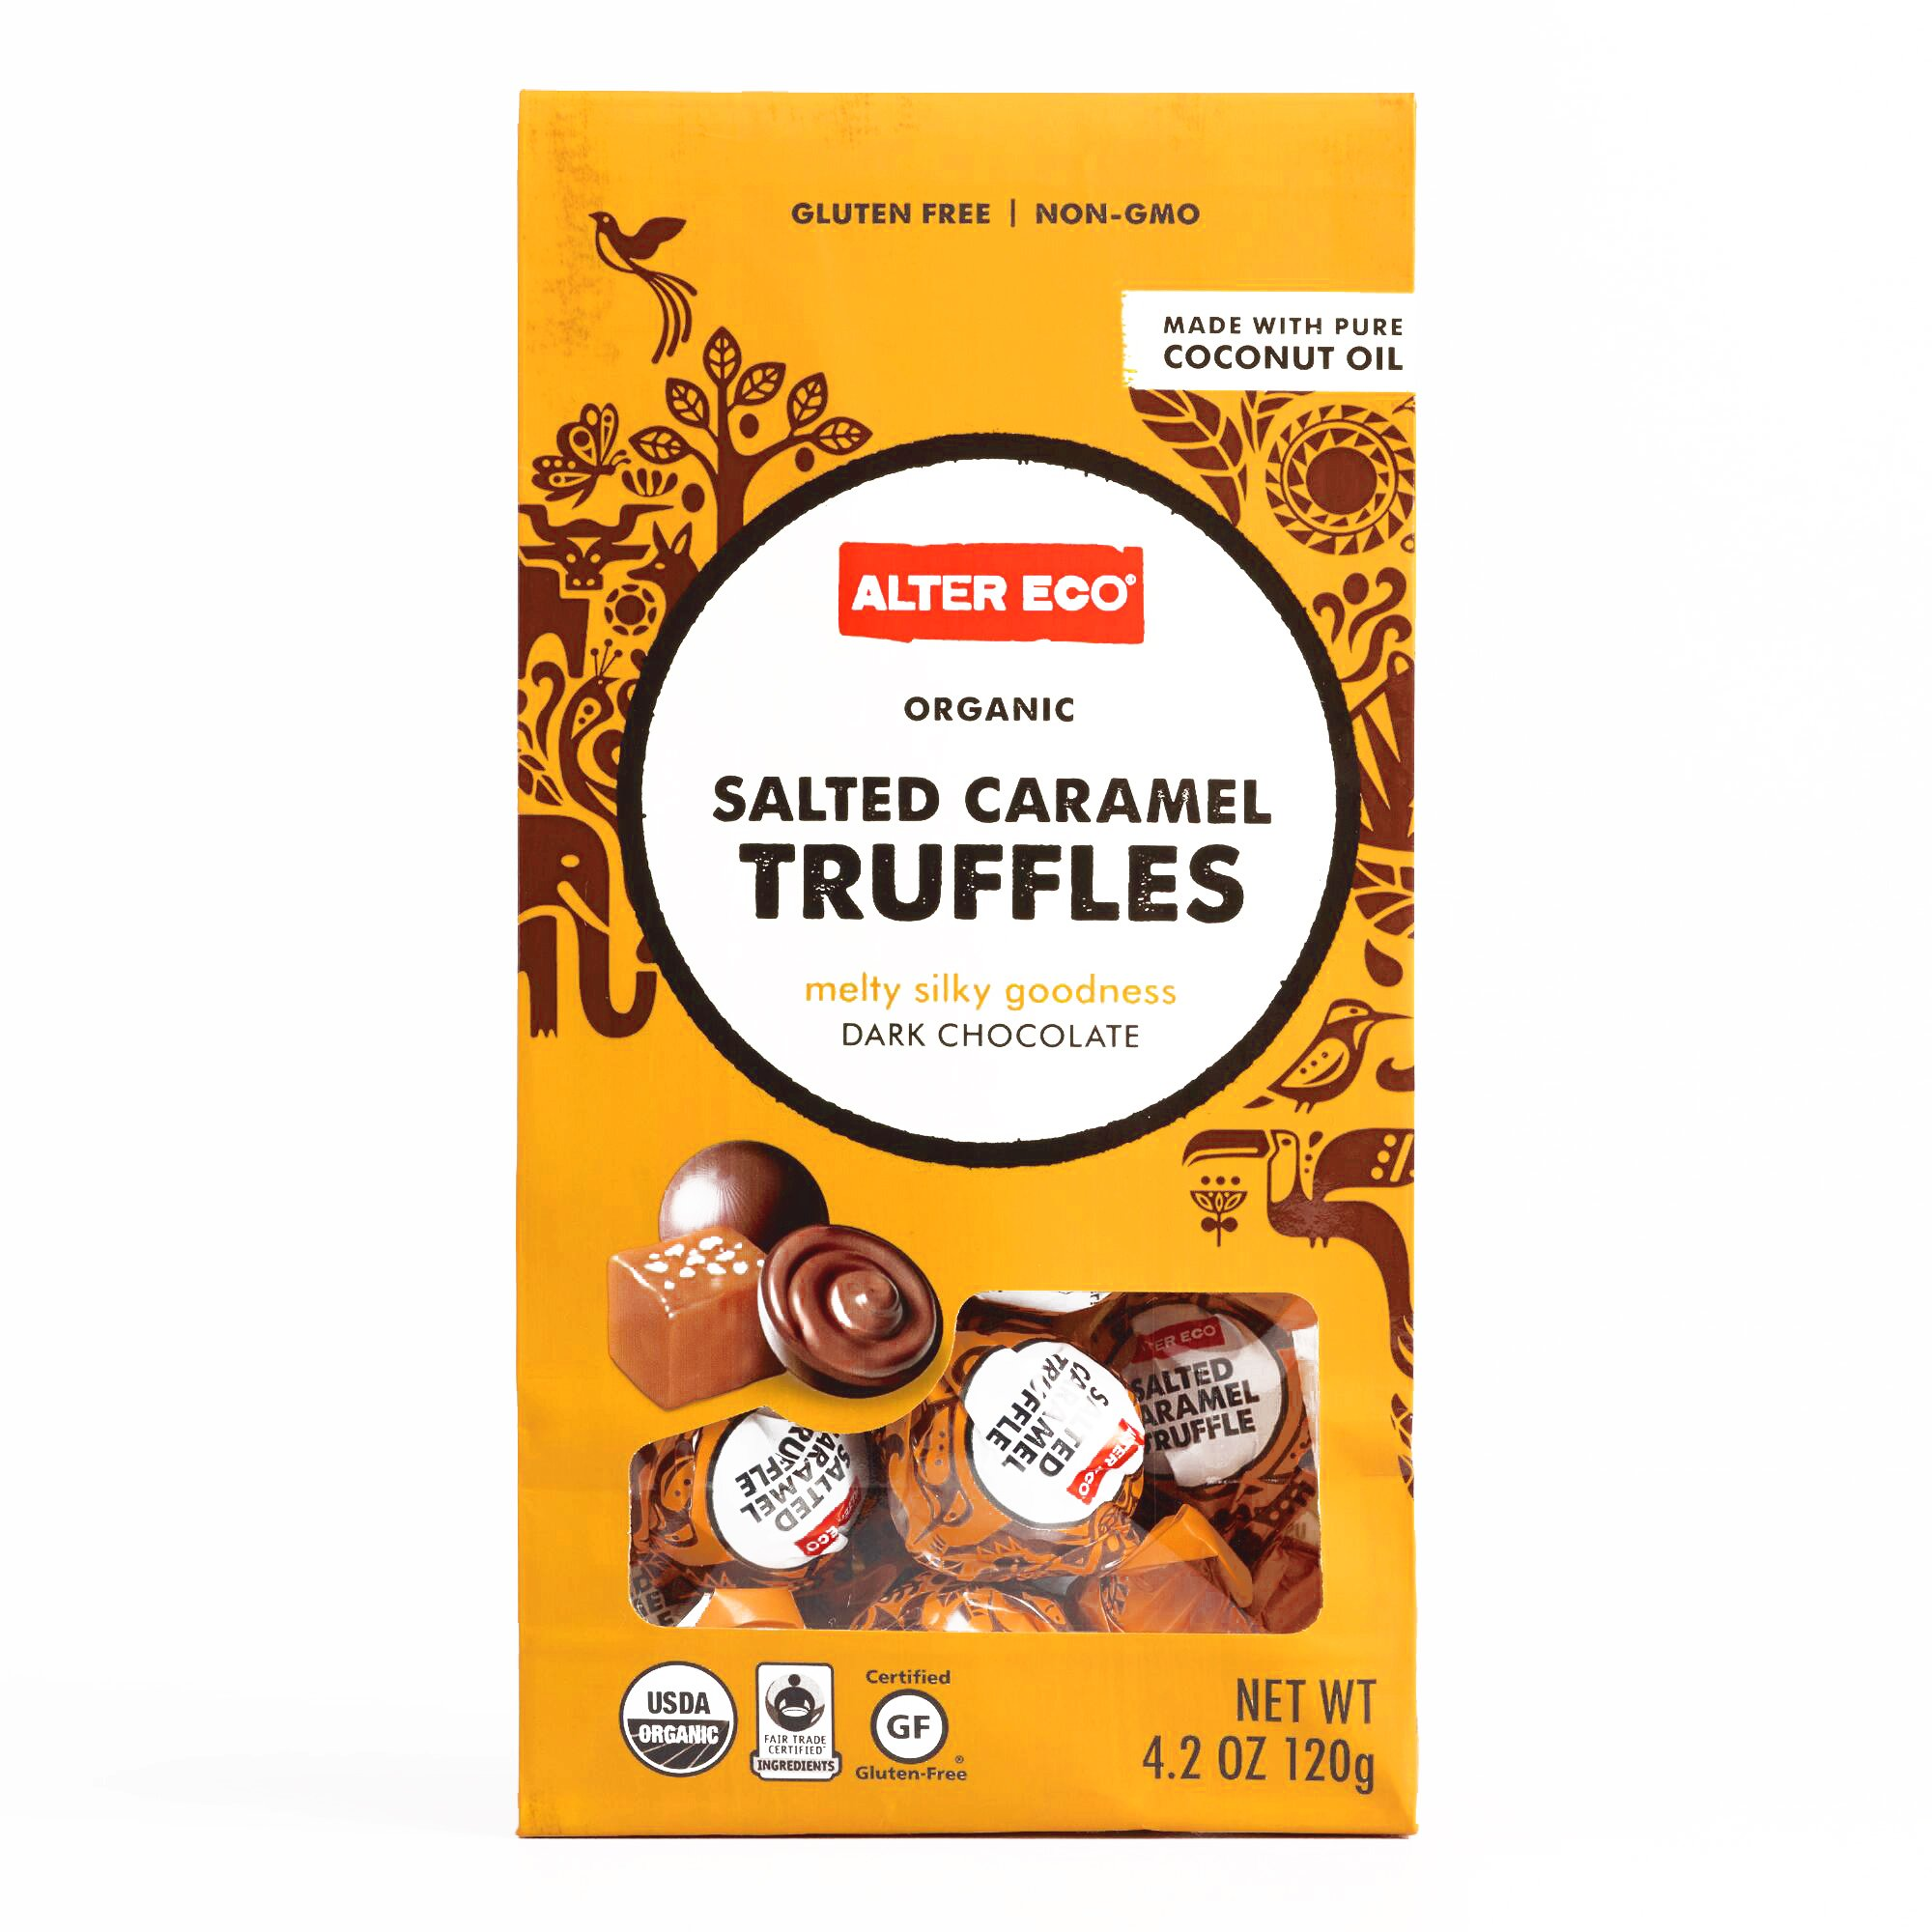 Alter Eco Organic Salted Caramel Truffles 4.2 oz each (2 Items Per Order, not per case)